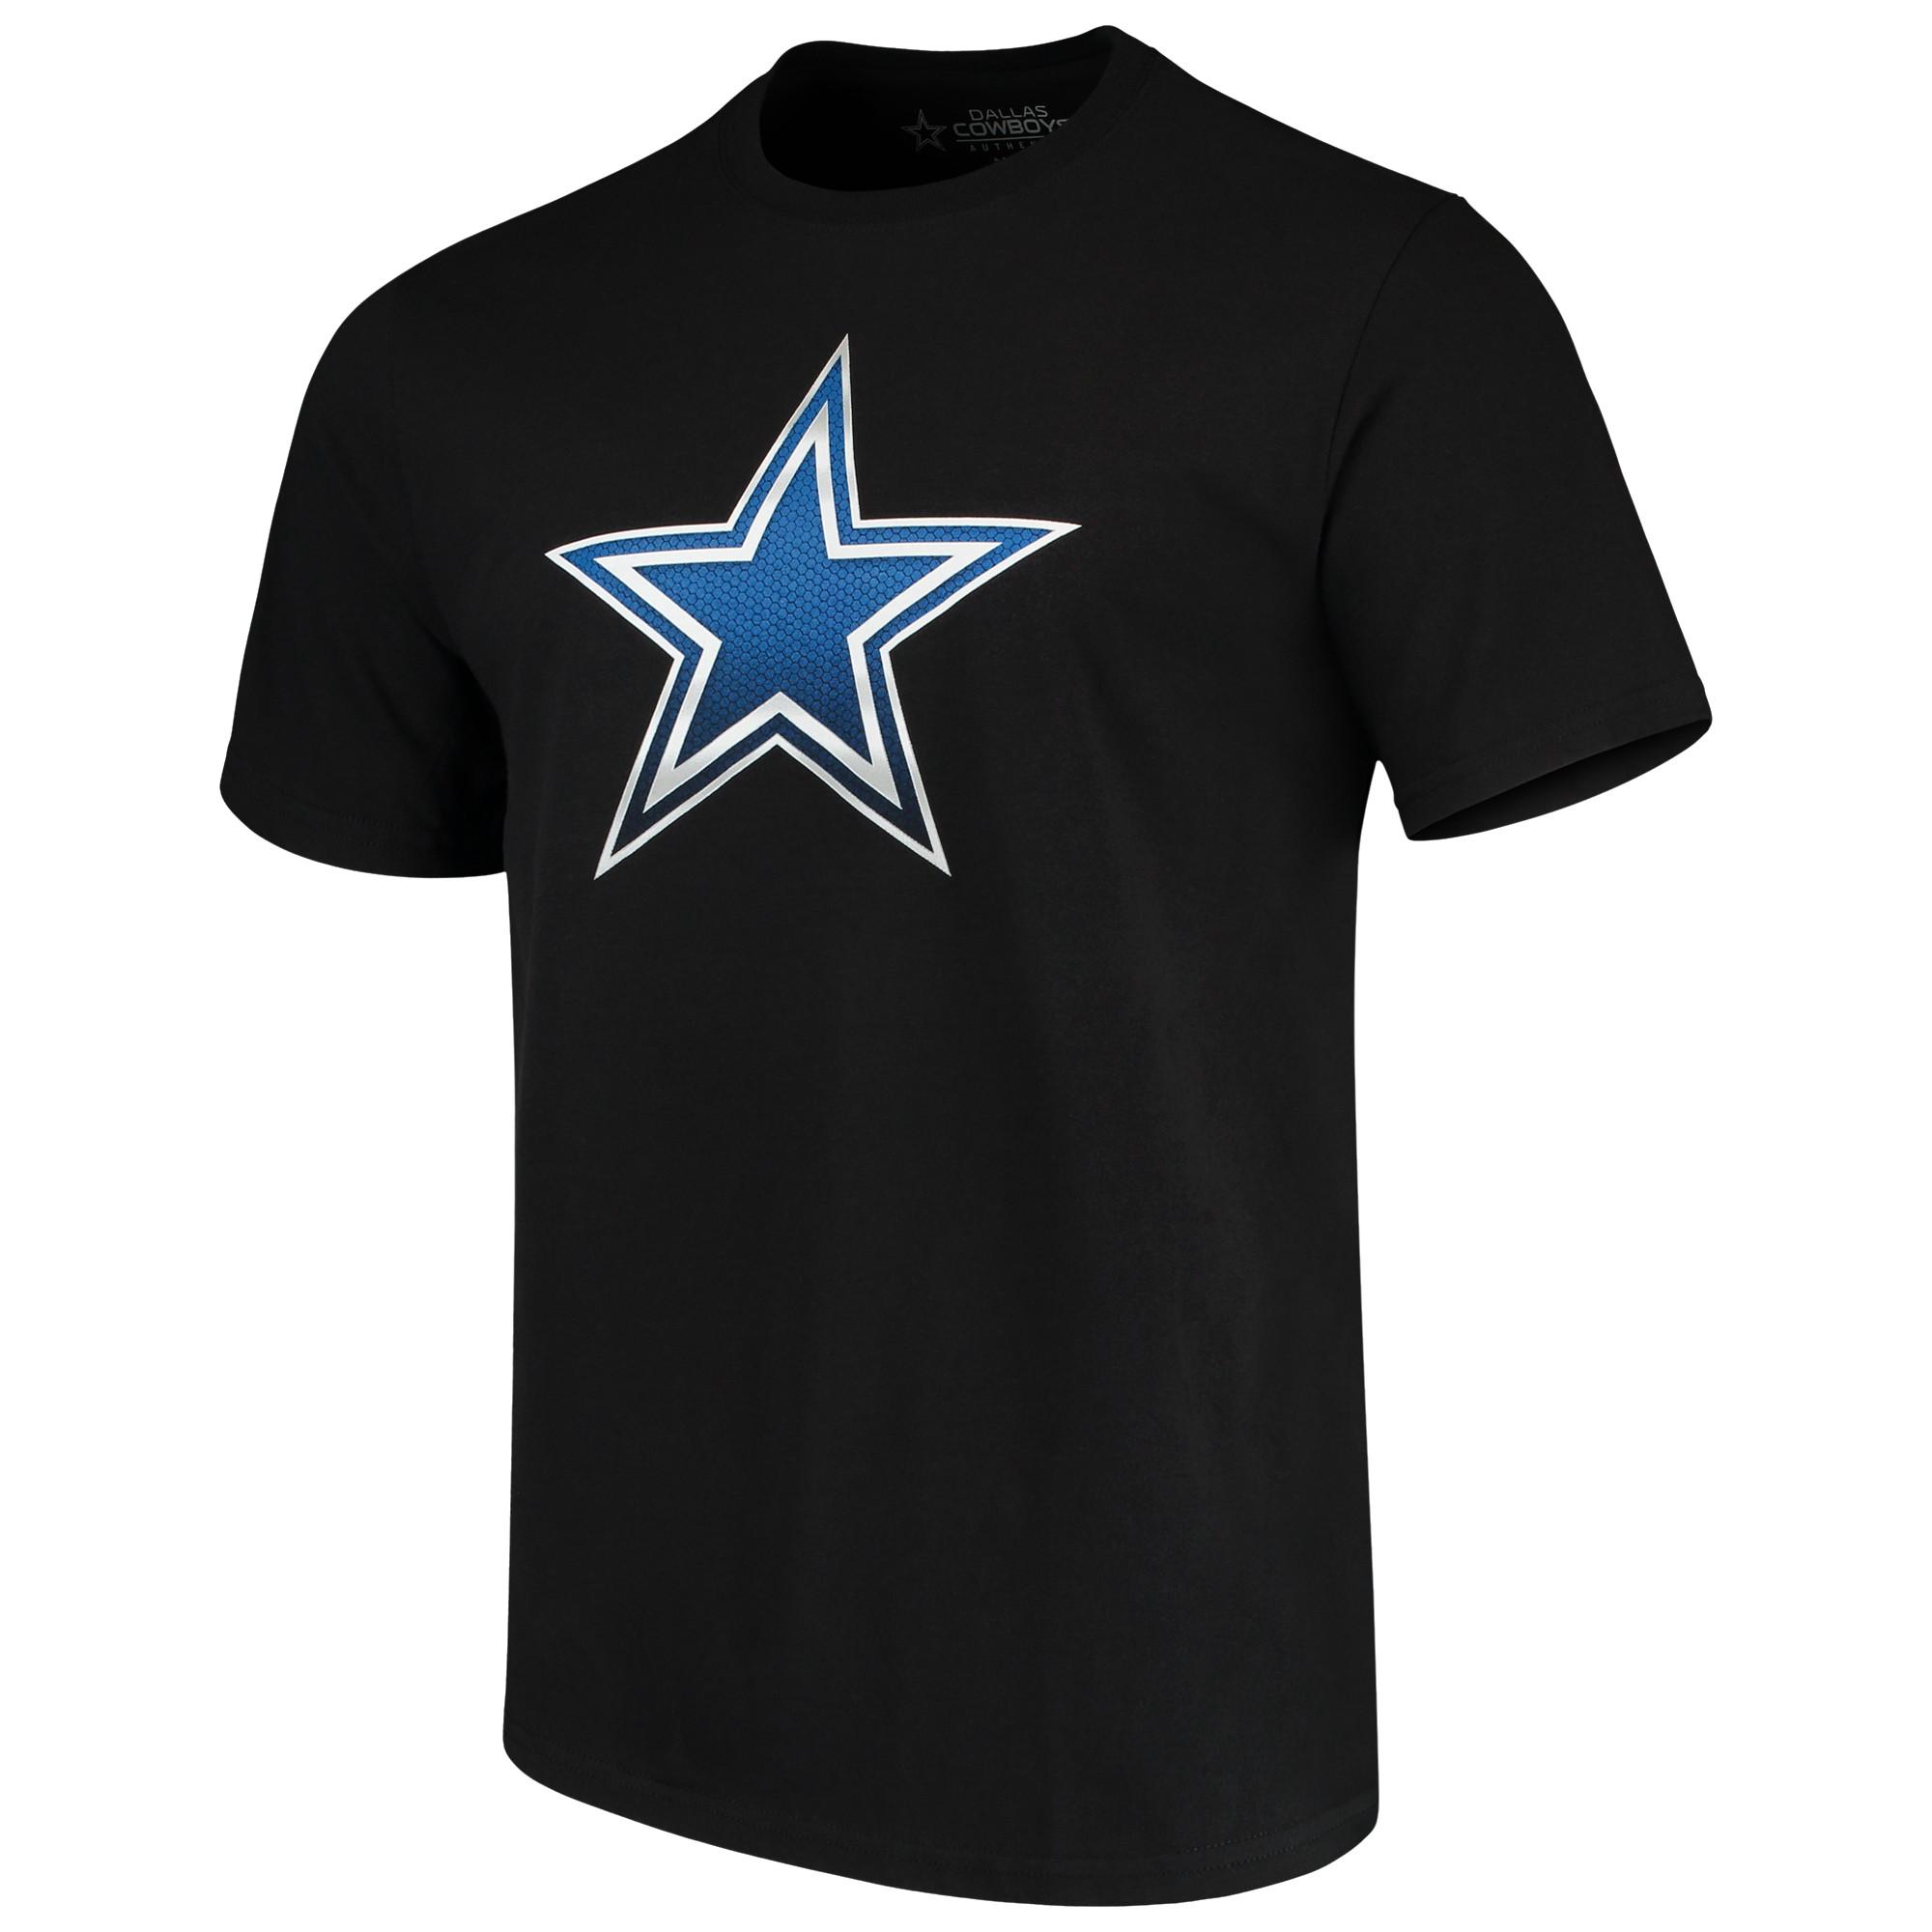 Men's Black Dallas Cowboys Keen Star T-Shirt